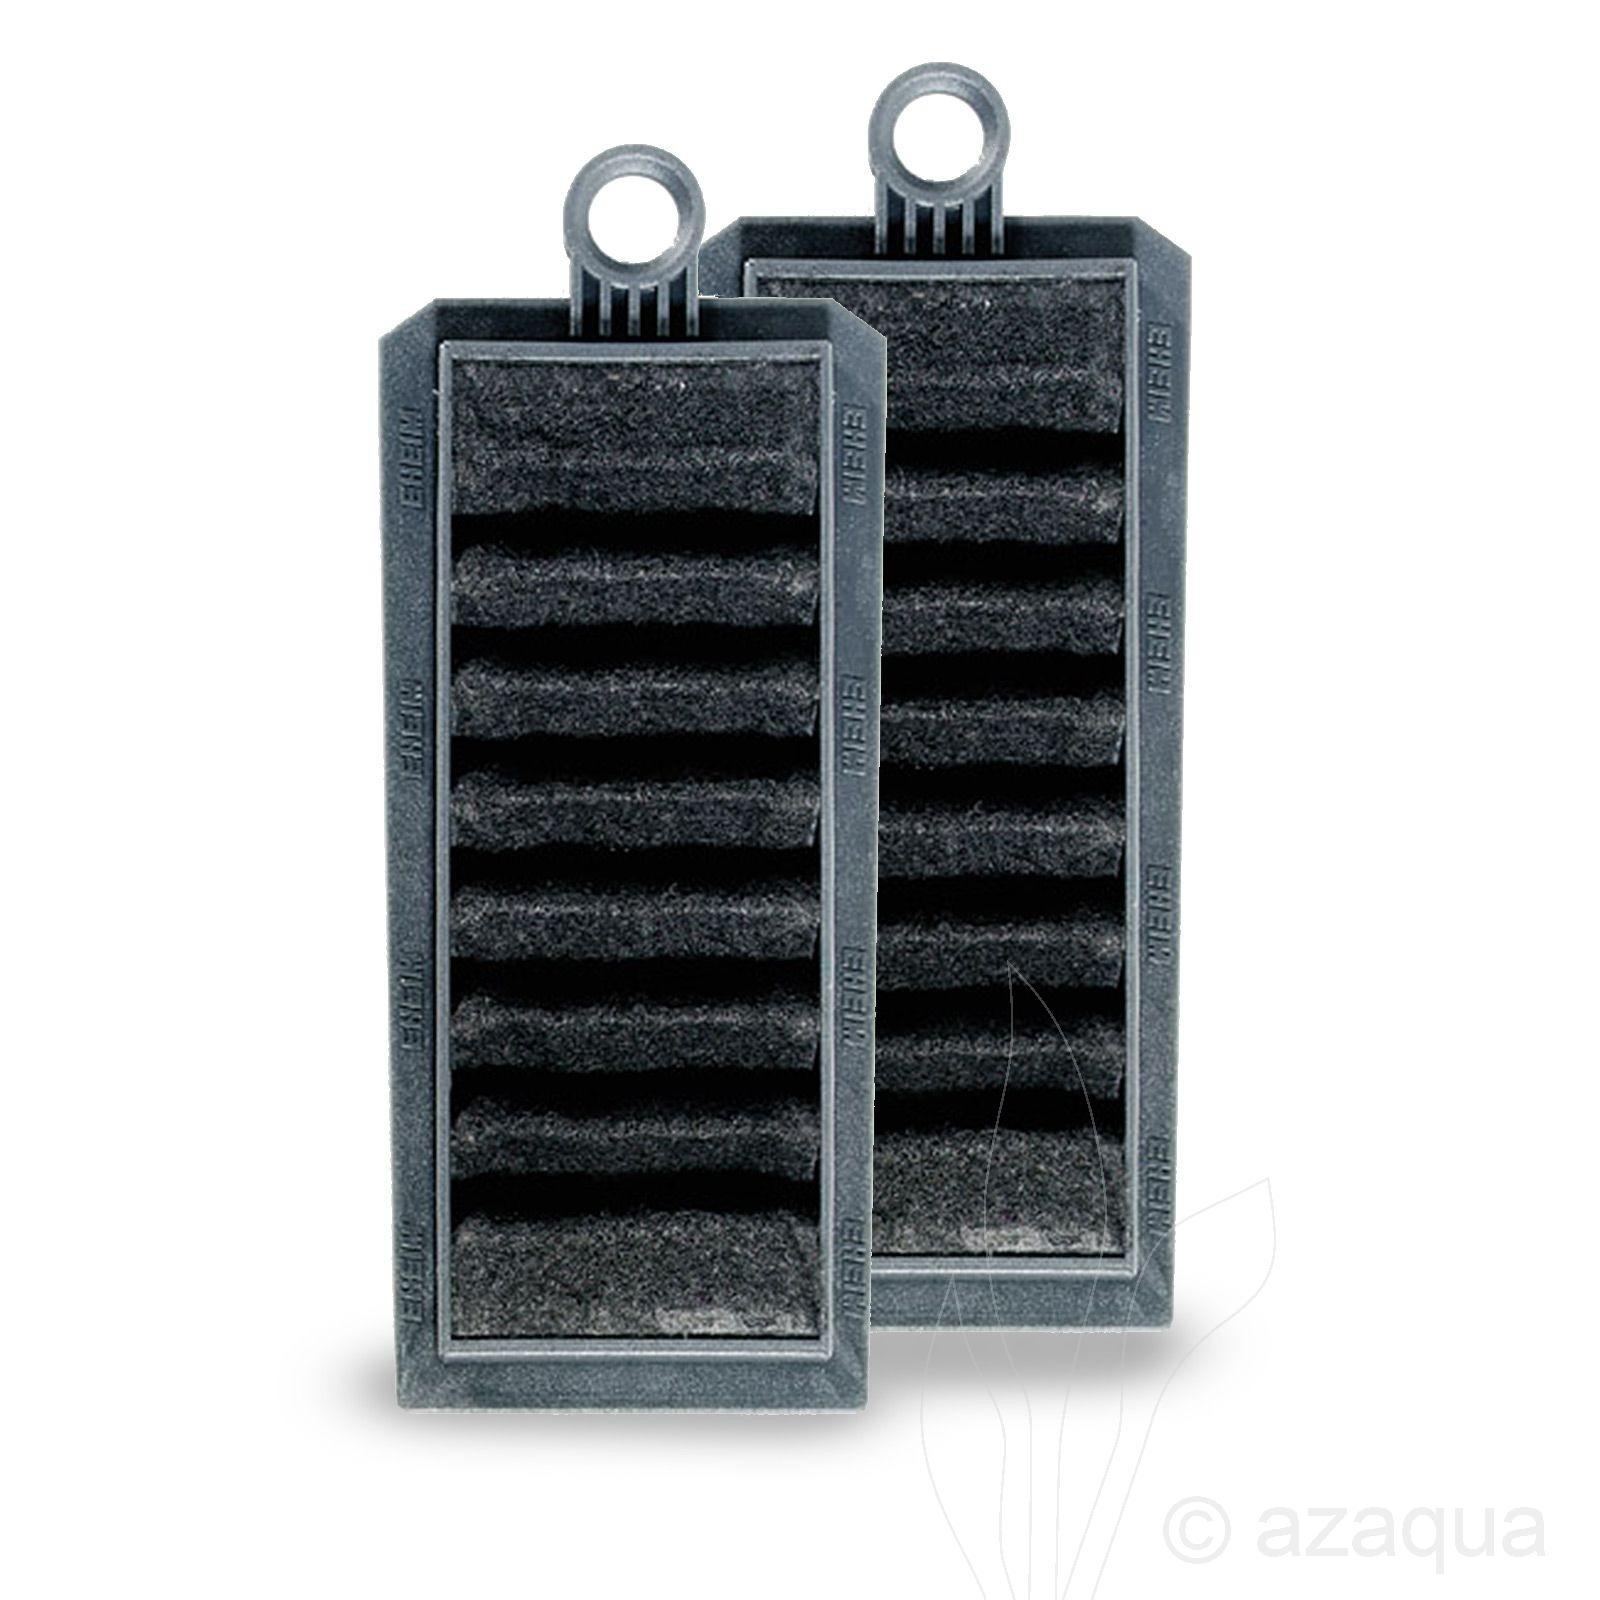 Eheim Carbon cartridge to Liberty